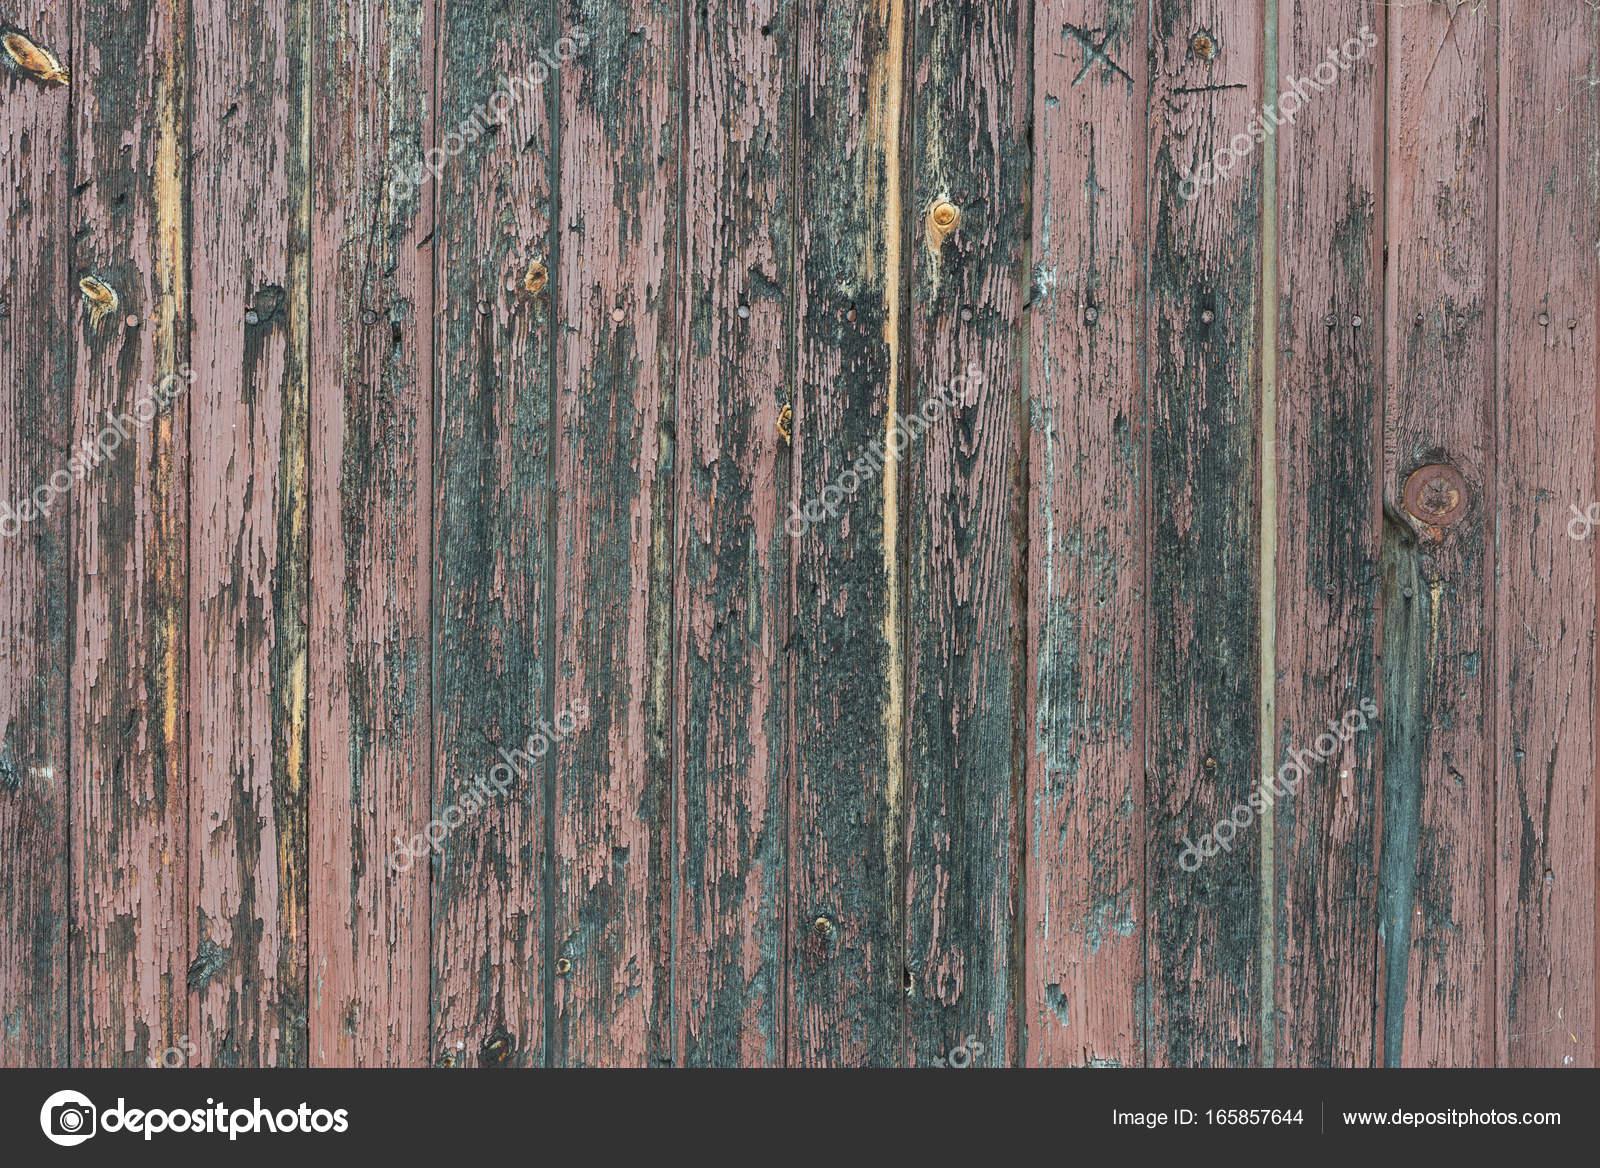 Fondo en estilo rústico de viejas tablas pintadas madera desnudas ...